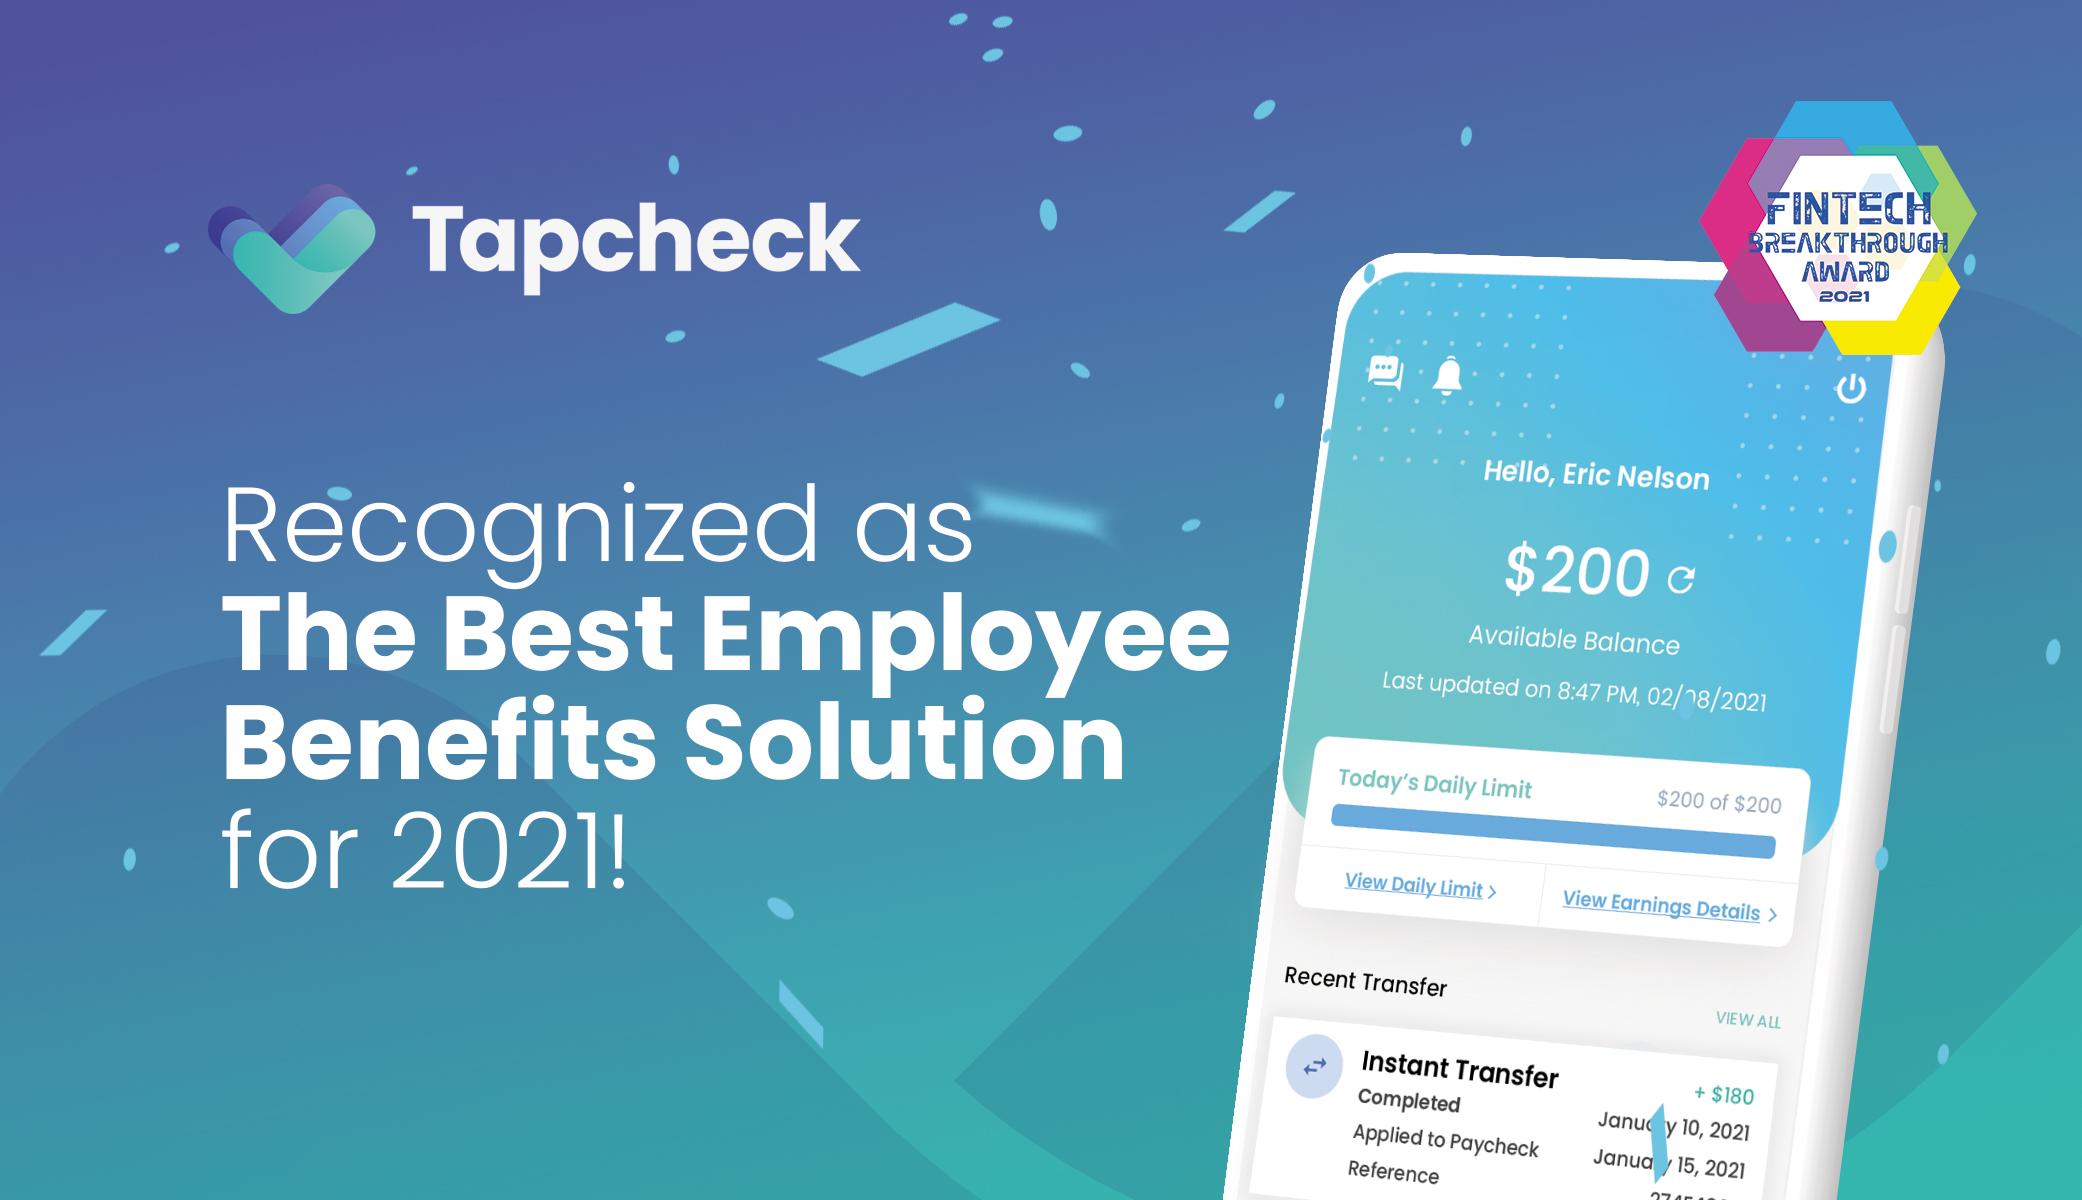 tap21 fintech press release phone 0308